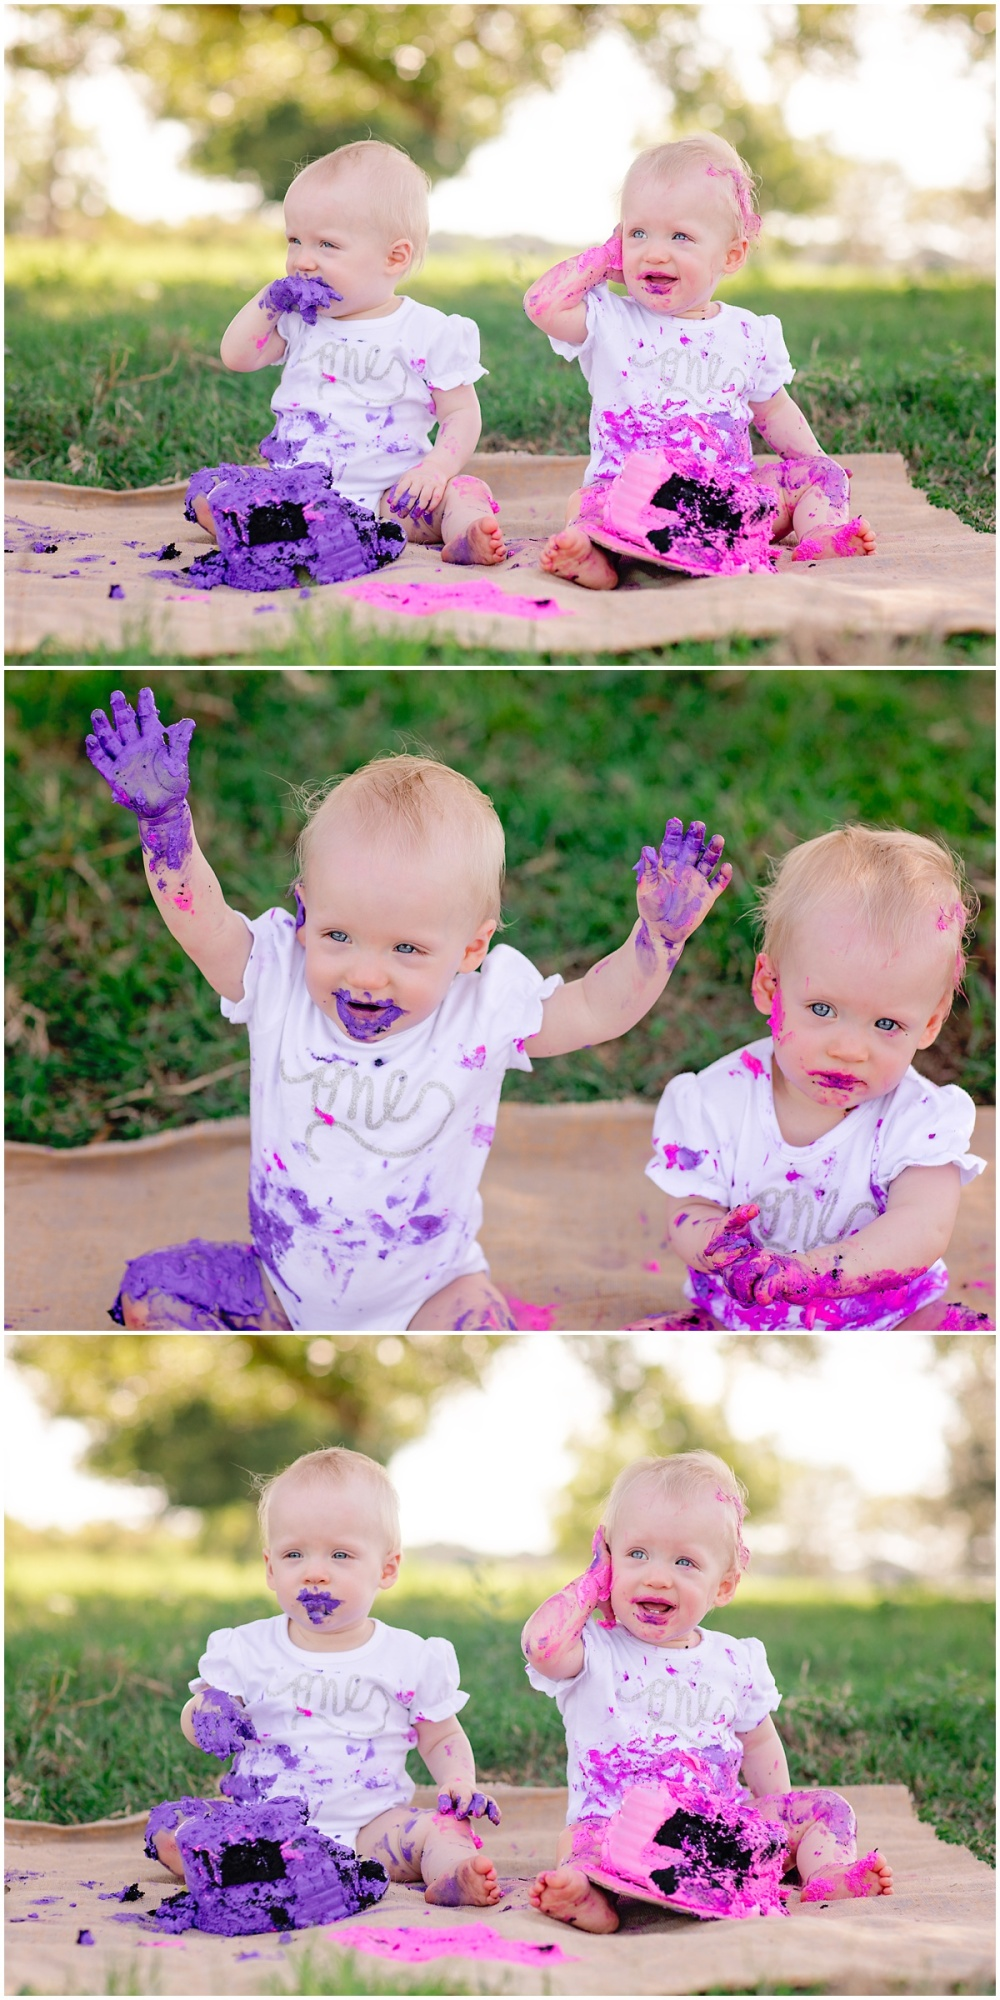 Family-Children-Portraits-Cake-Smash-Photos-San-Antonio-Hill-Country-Texas-Carly-Barton-Photography_0011.jpg